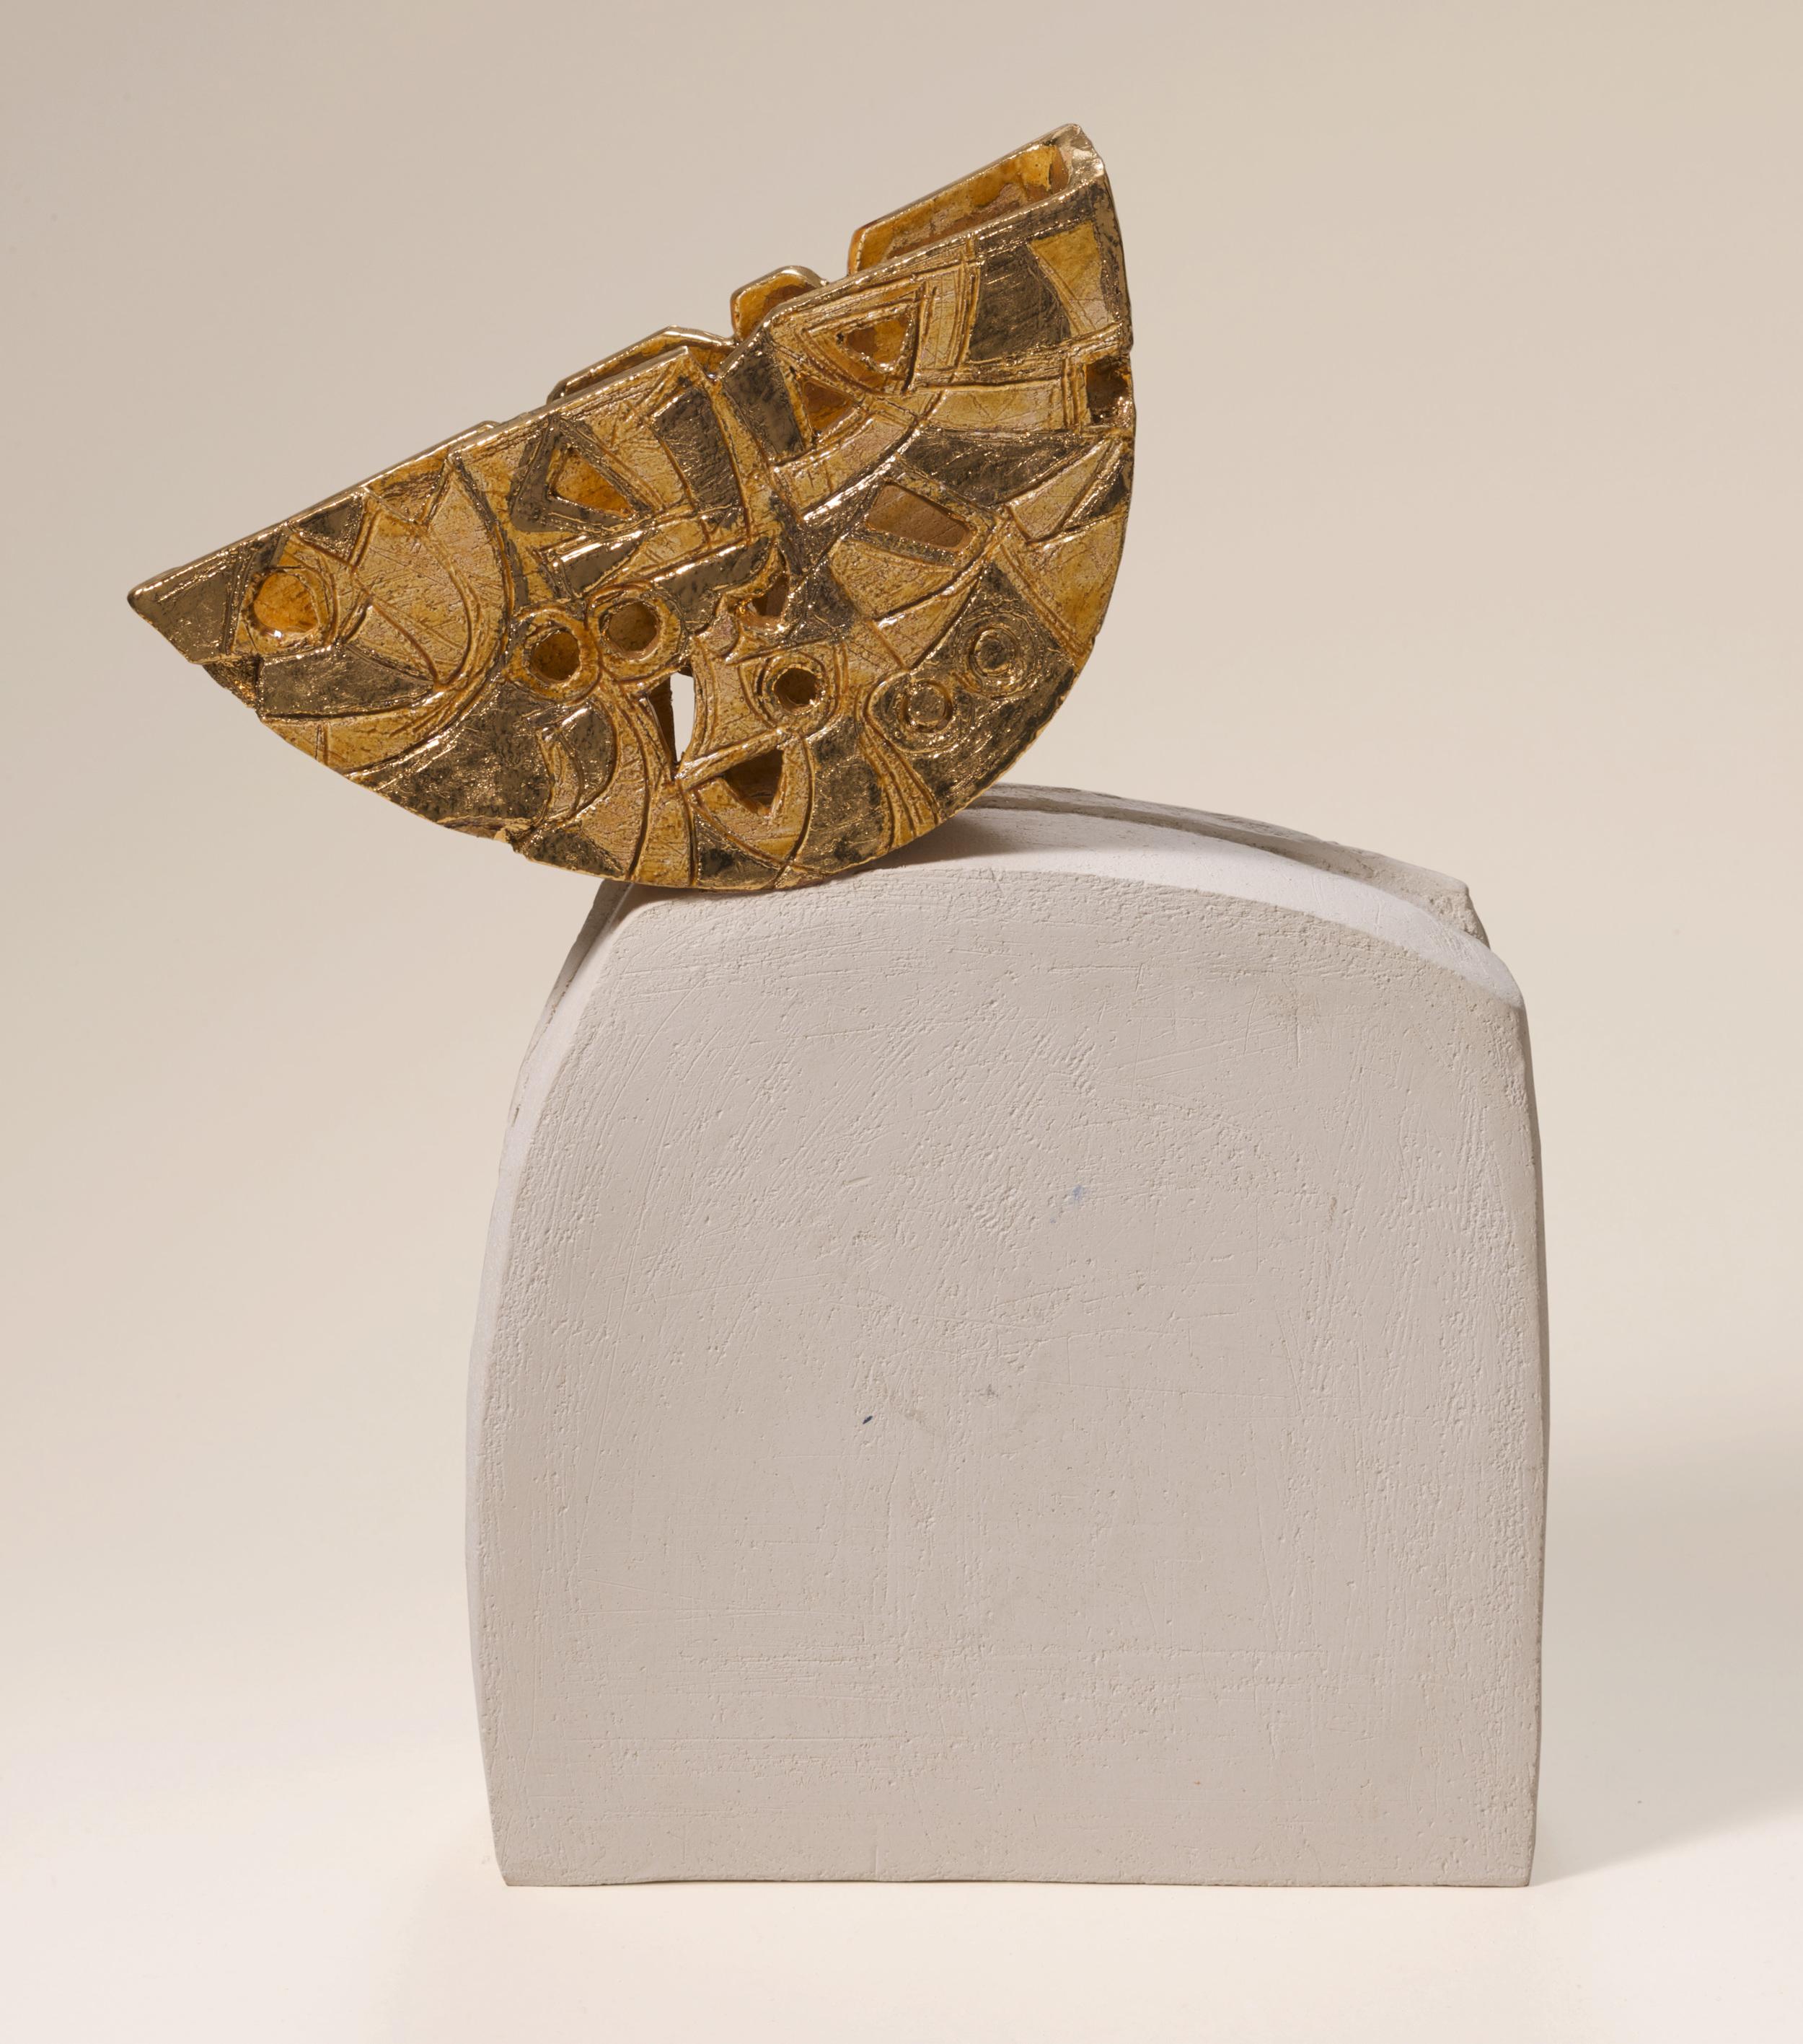 Ainaki Ghabeta Nakheel       Earthstone and gold 42x32x7cm 2008 Private Collection UK